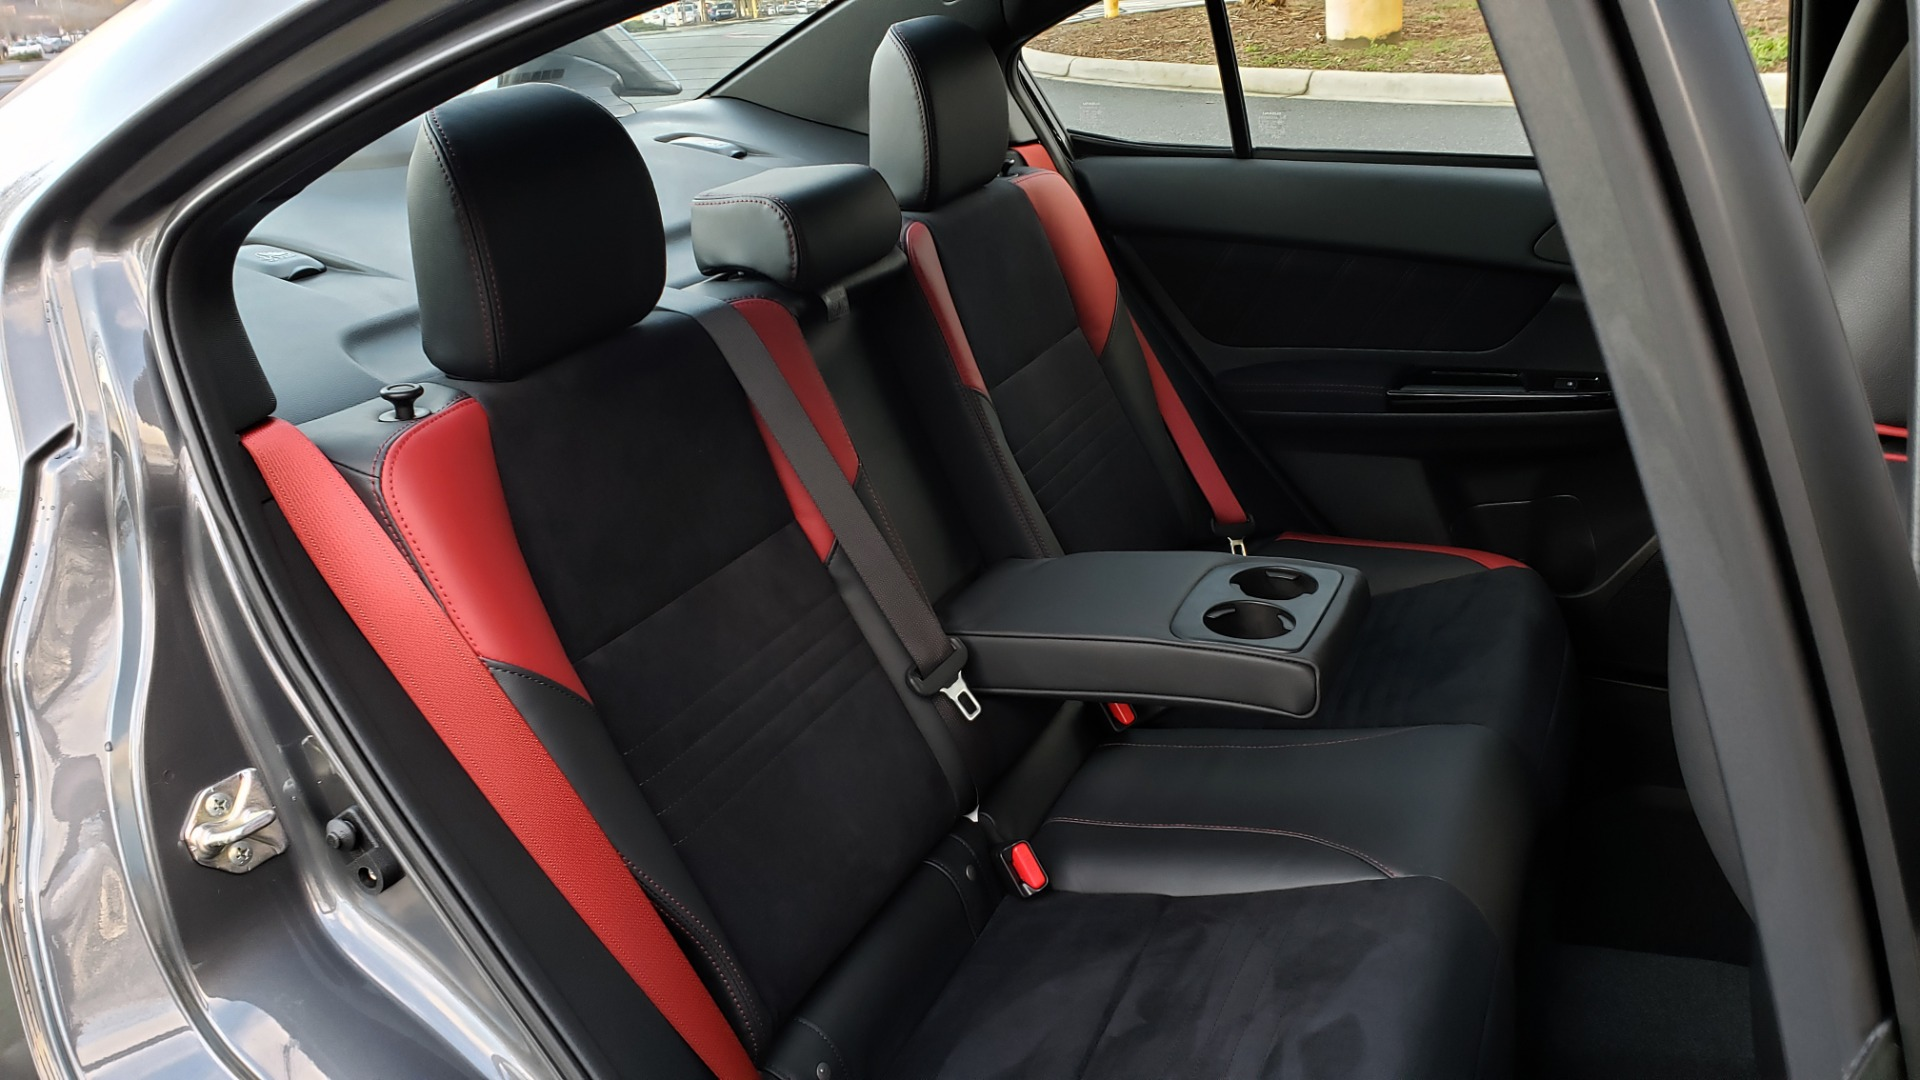 Used 2020 Subaru WRX STI 2.5L TURBO / 6-SPEED MANUAL / RECARO SEATS / REARVIEW for sale Sold at Formula Imports in Charlotte NC 28227 83